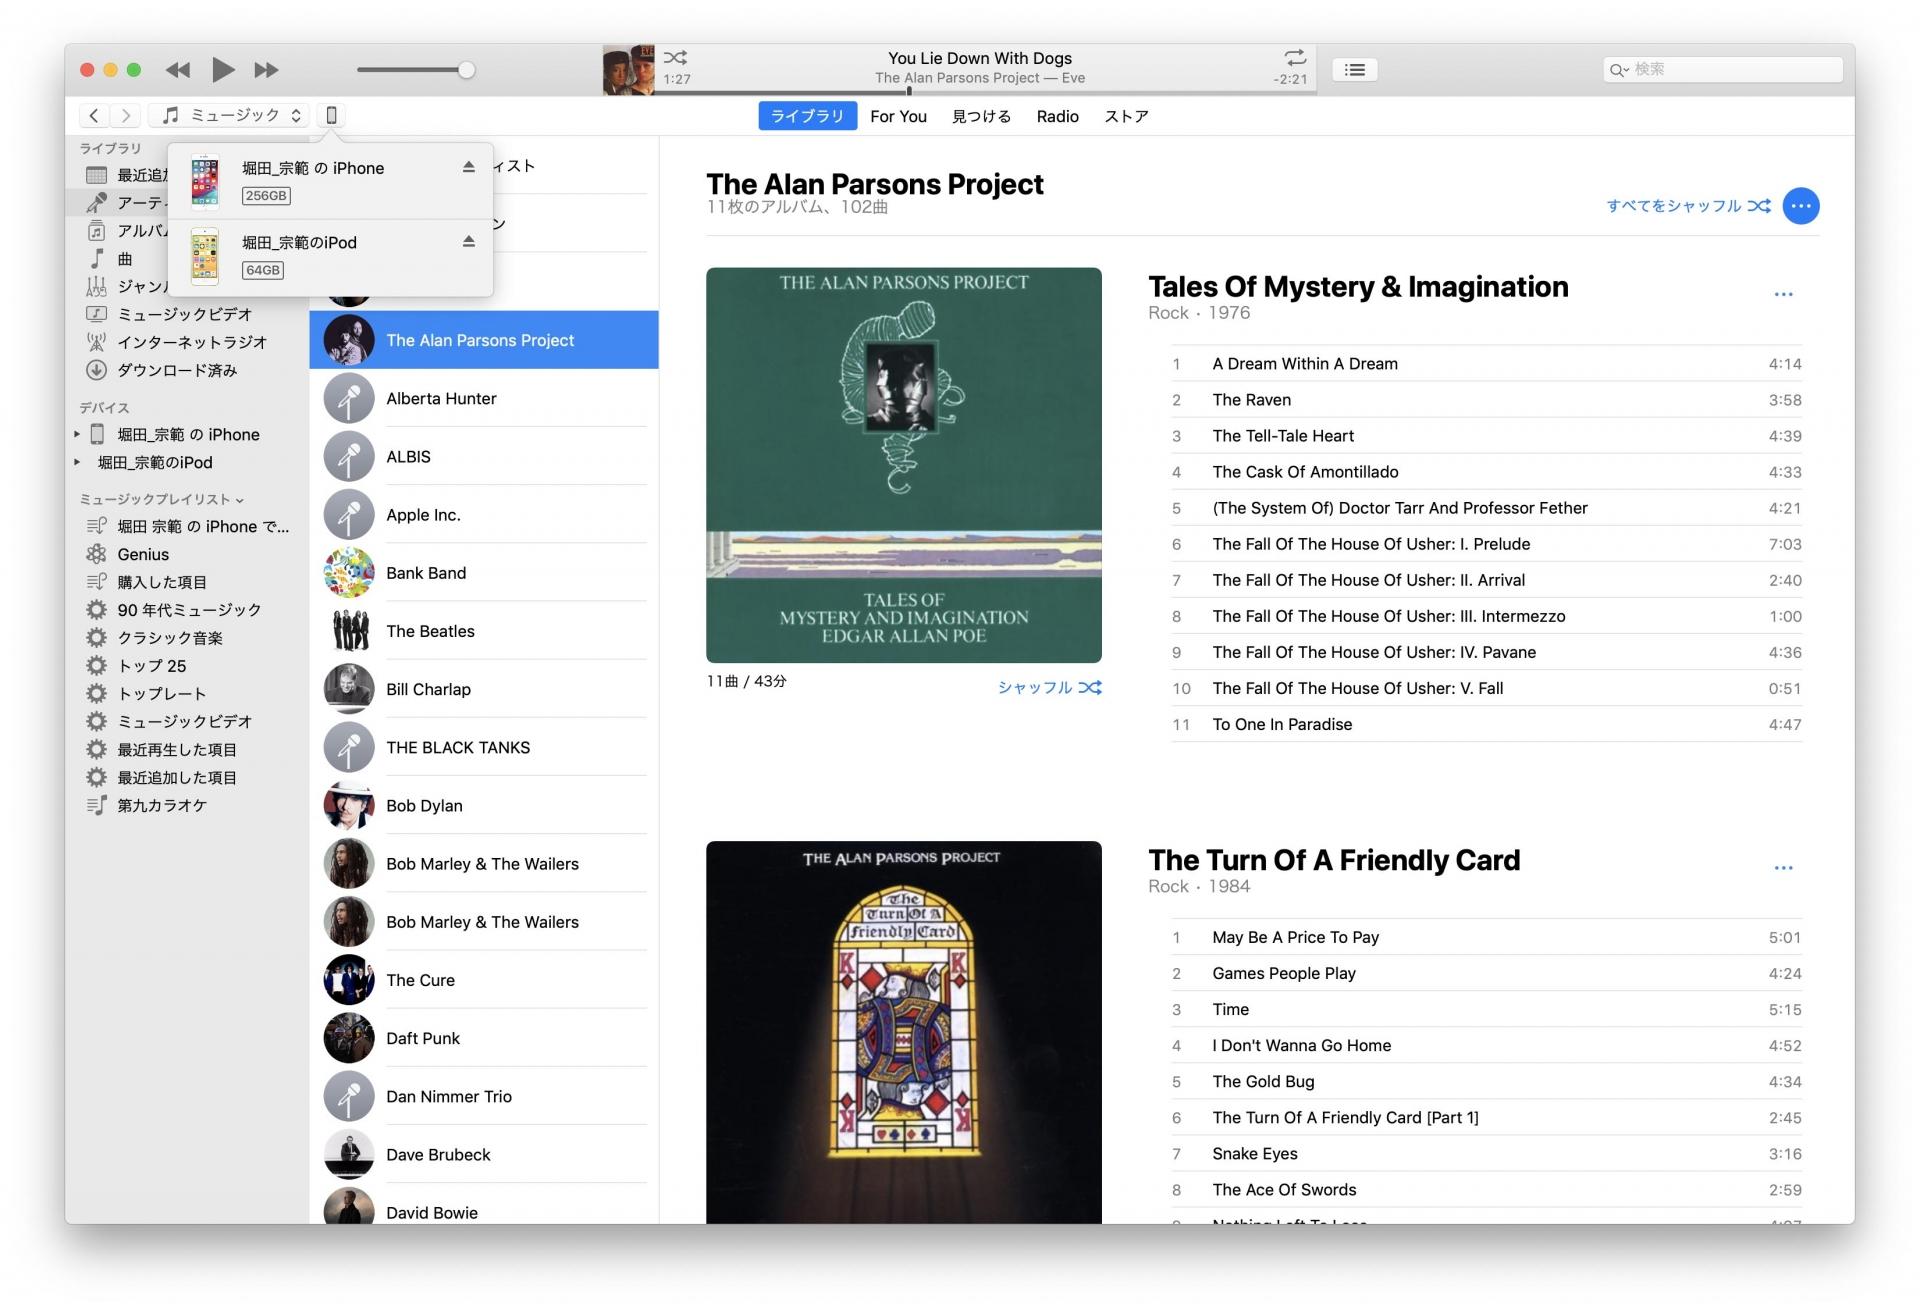 iTunesでWiFi経由